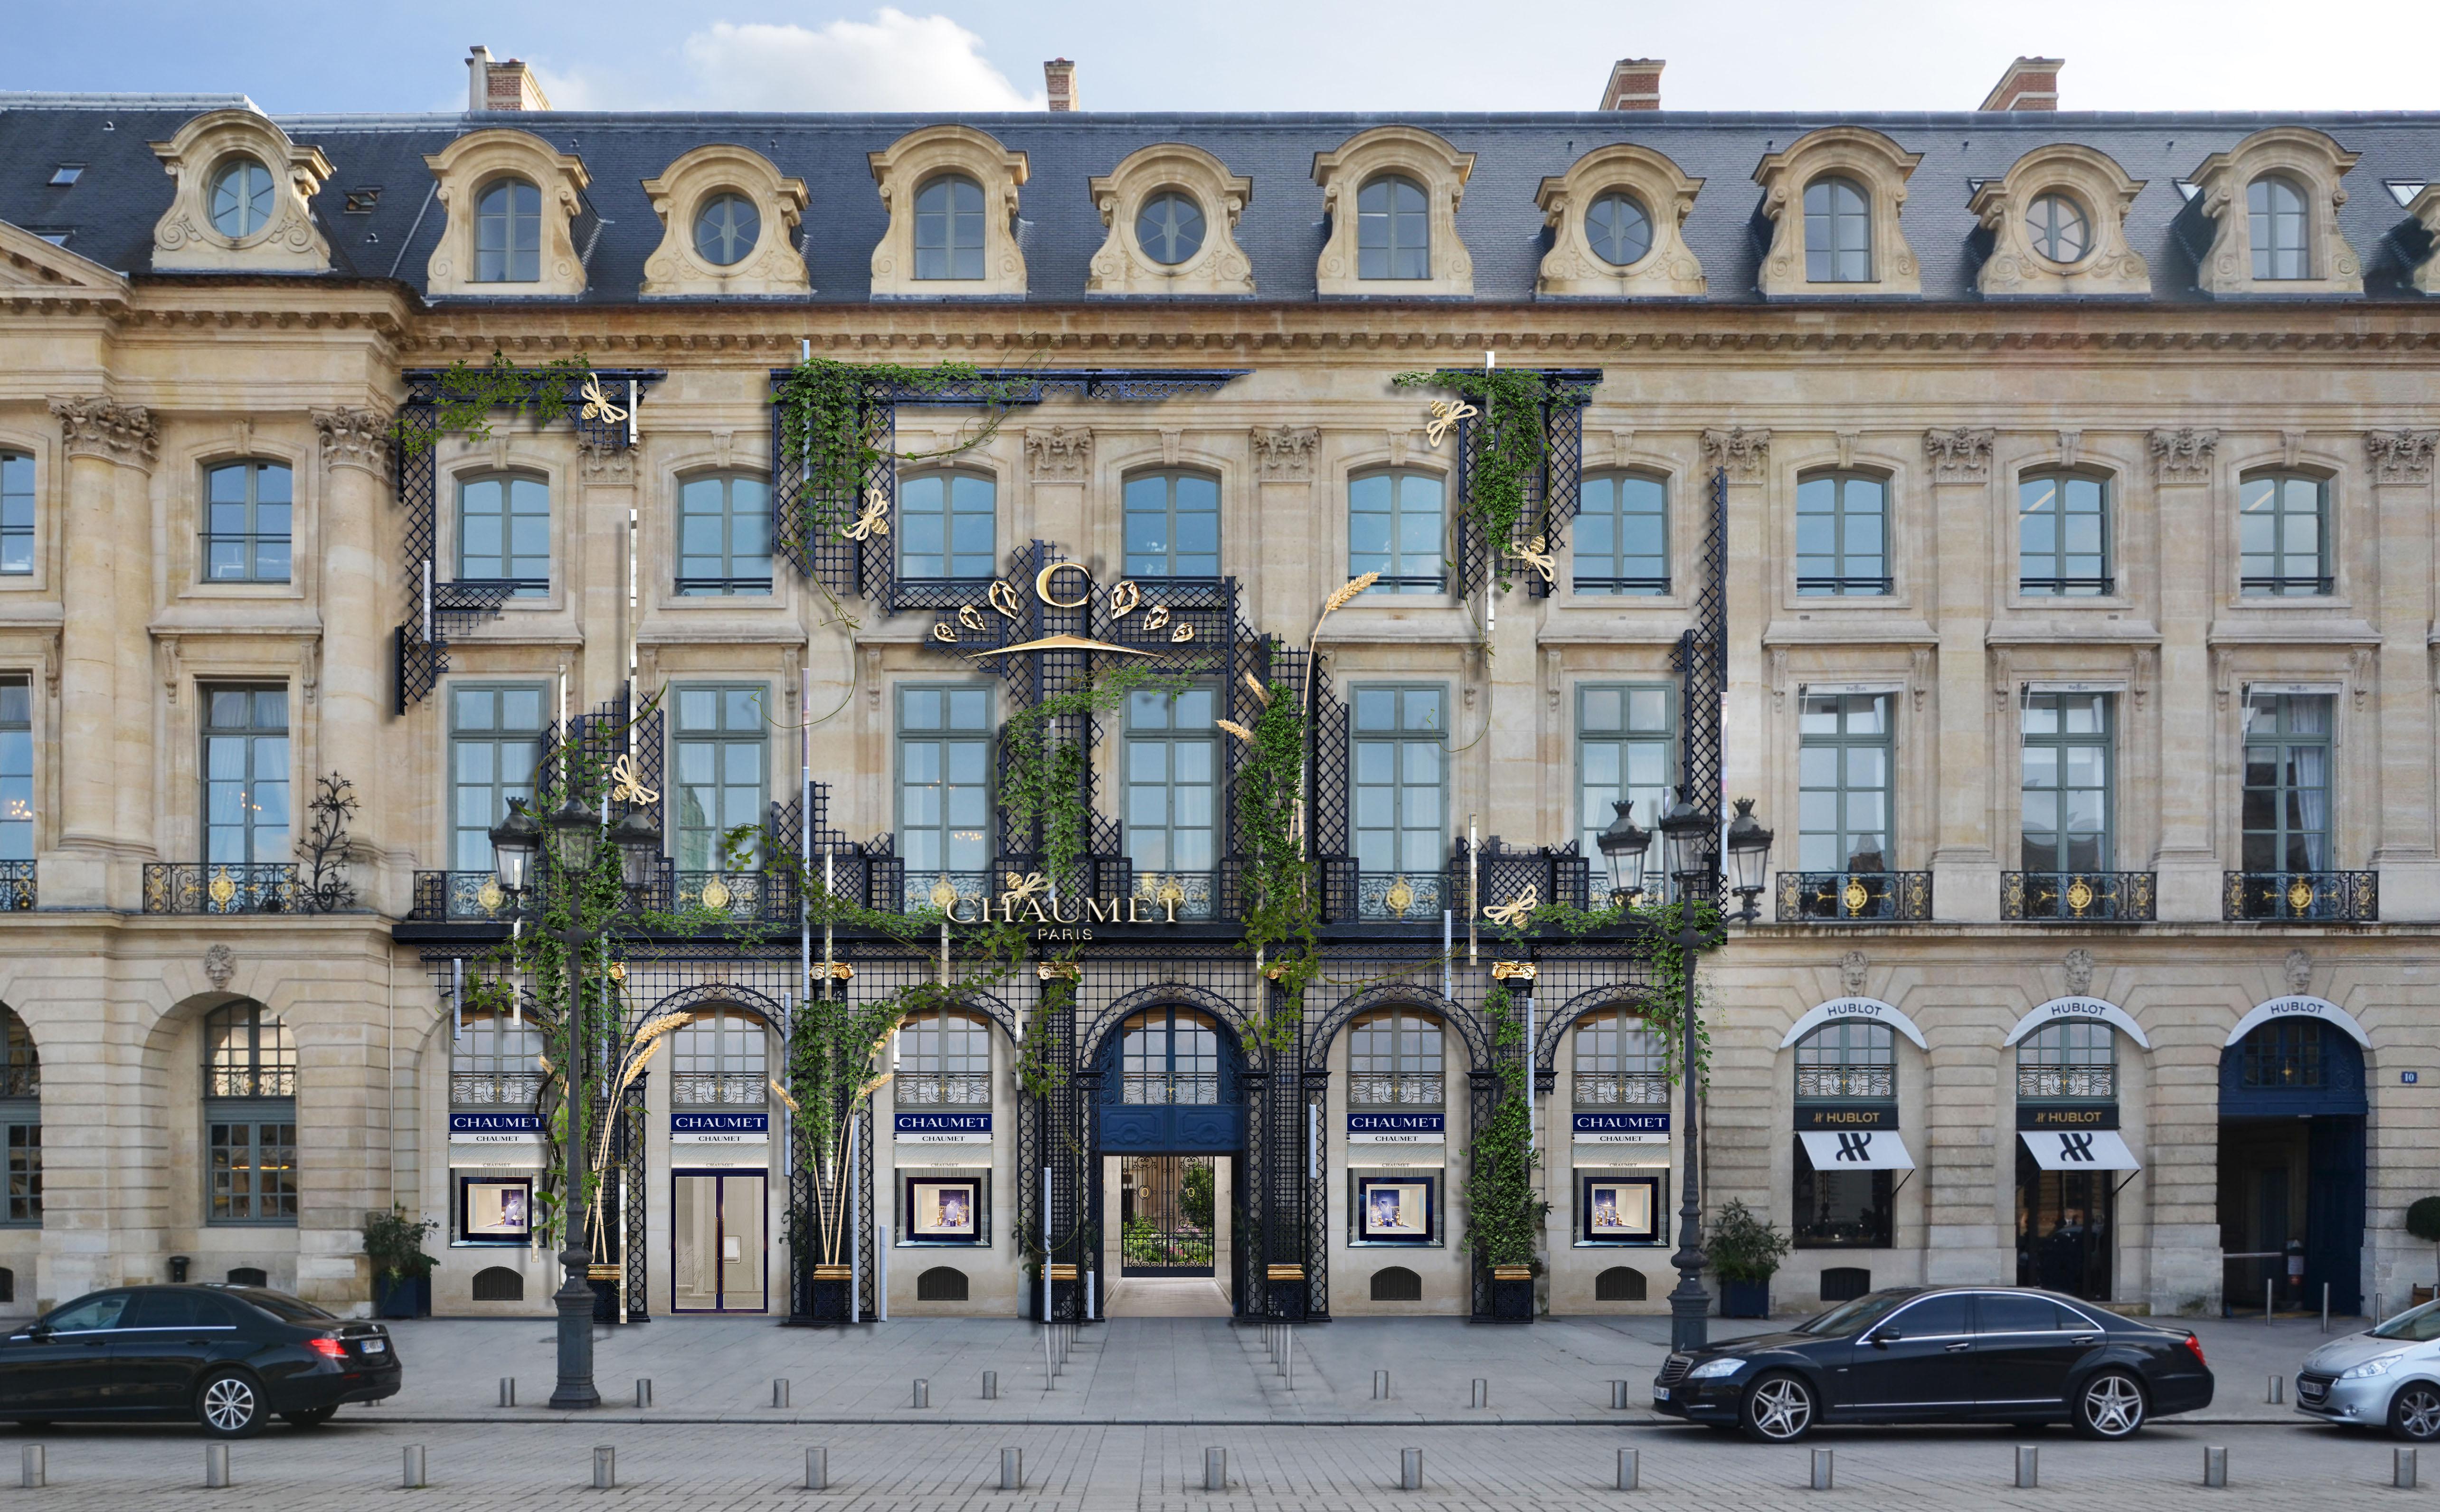 Chaumet has refurbished its Place Vendôme flagship.